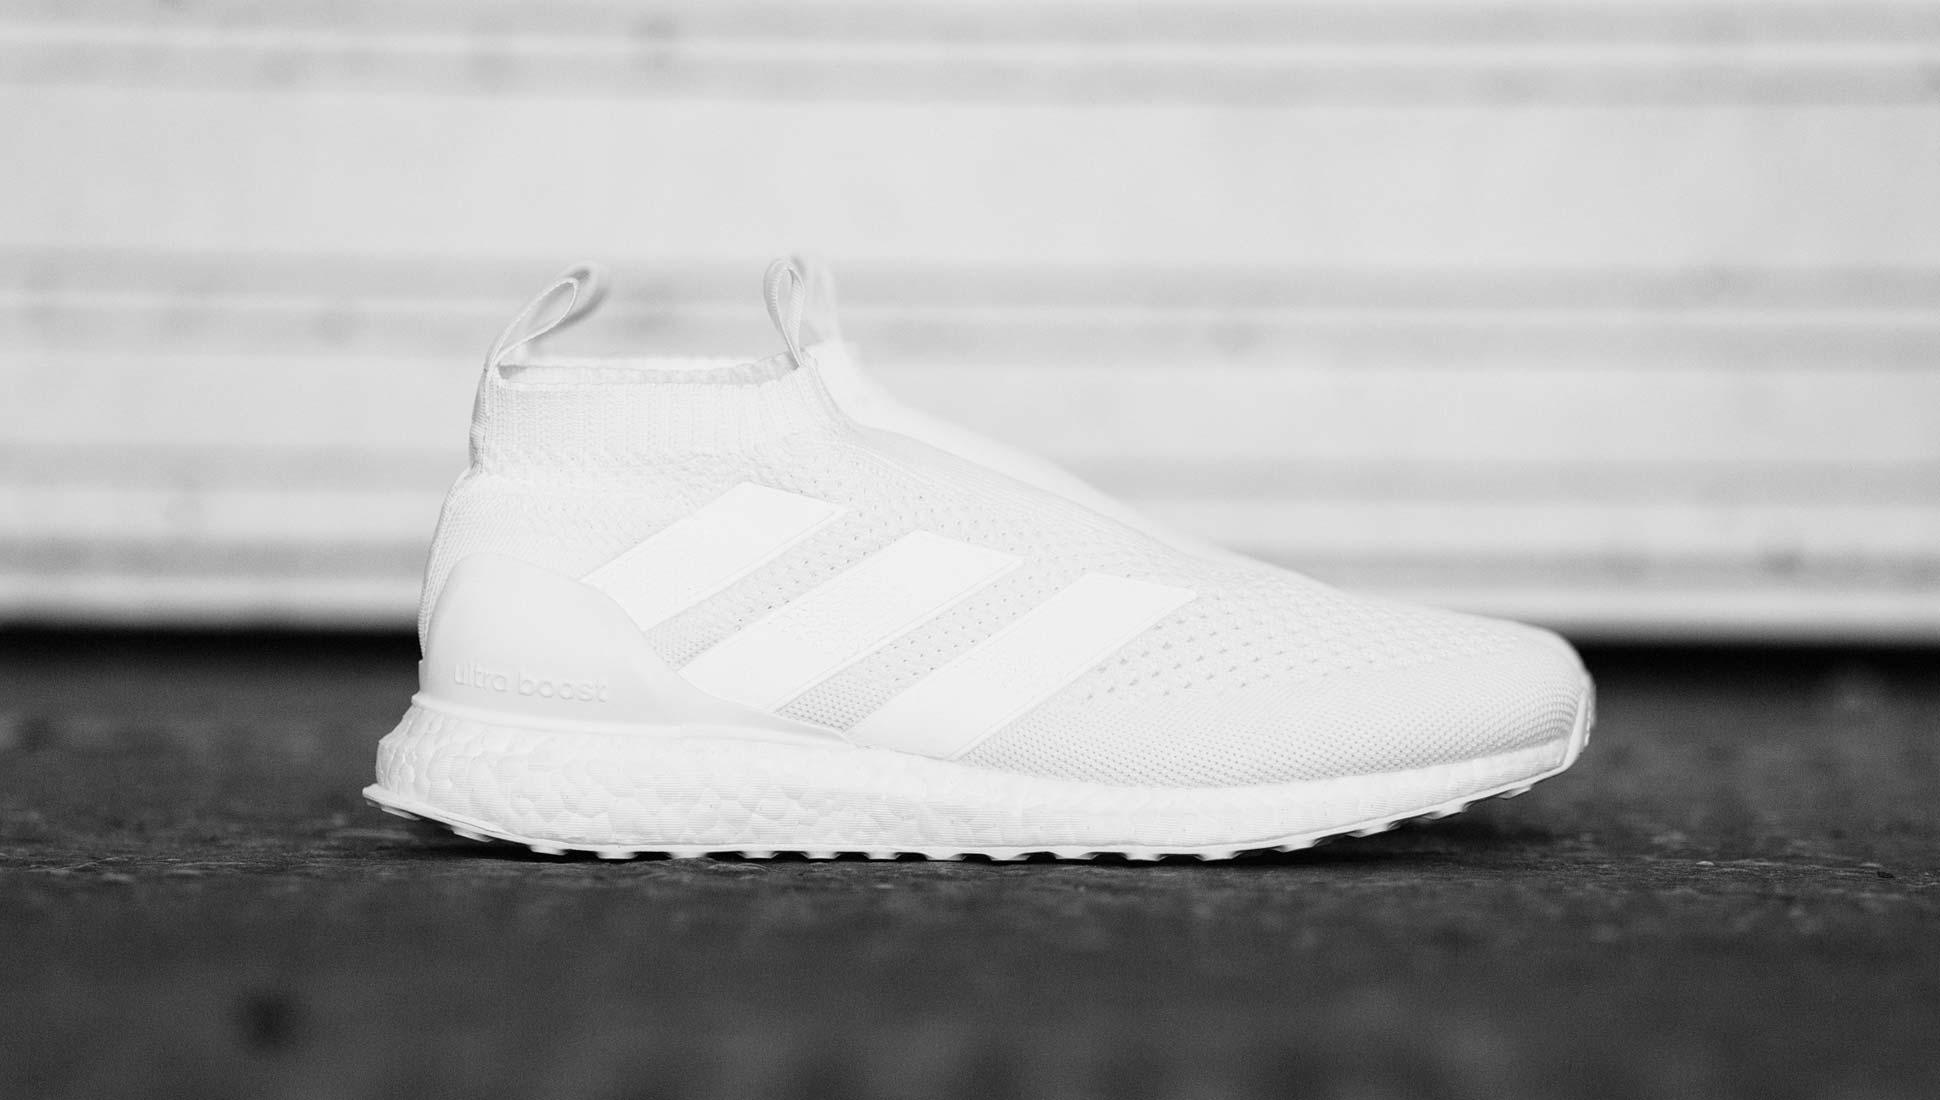 f7e1725ed adidas Purecontrol Ultra Boost Triple White Sneakers - SoccerBible